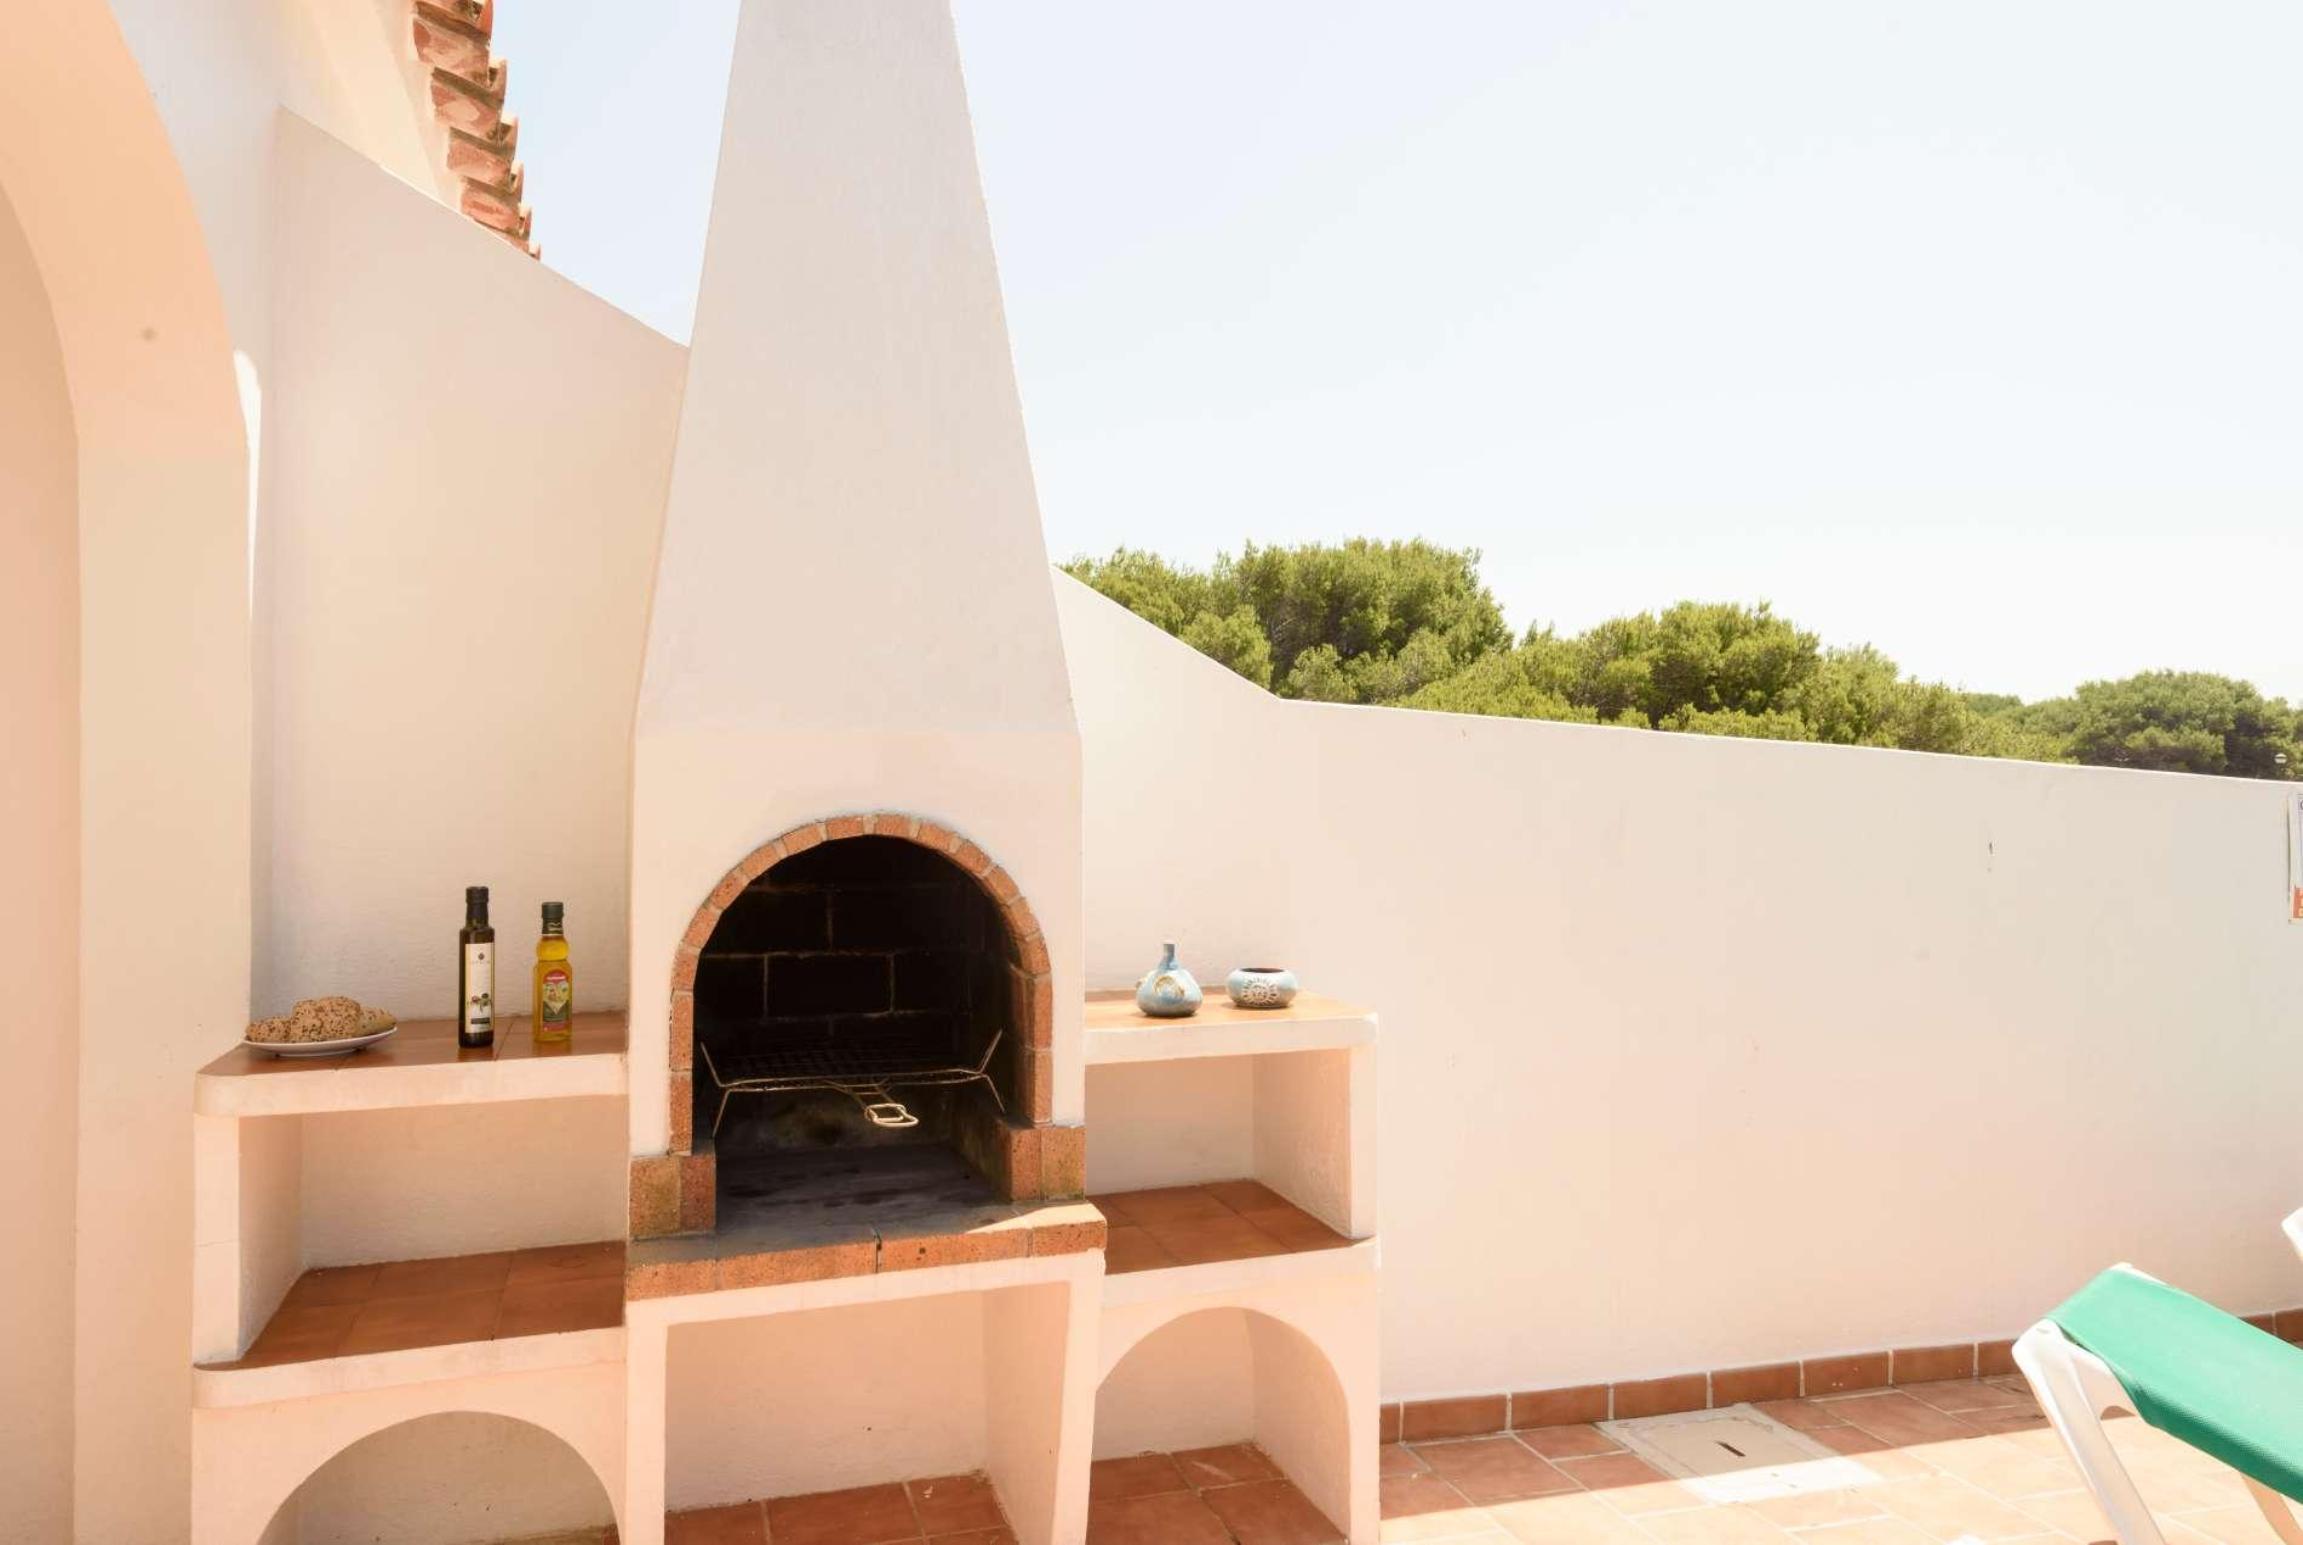 Ferienhaus Eulalia II (2653368), Arenal De'N Castell, Menorca, Balearische Inseln, Spanien, Bild 18